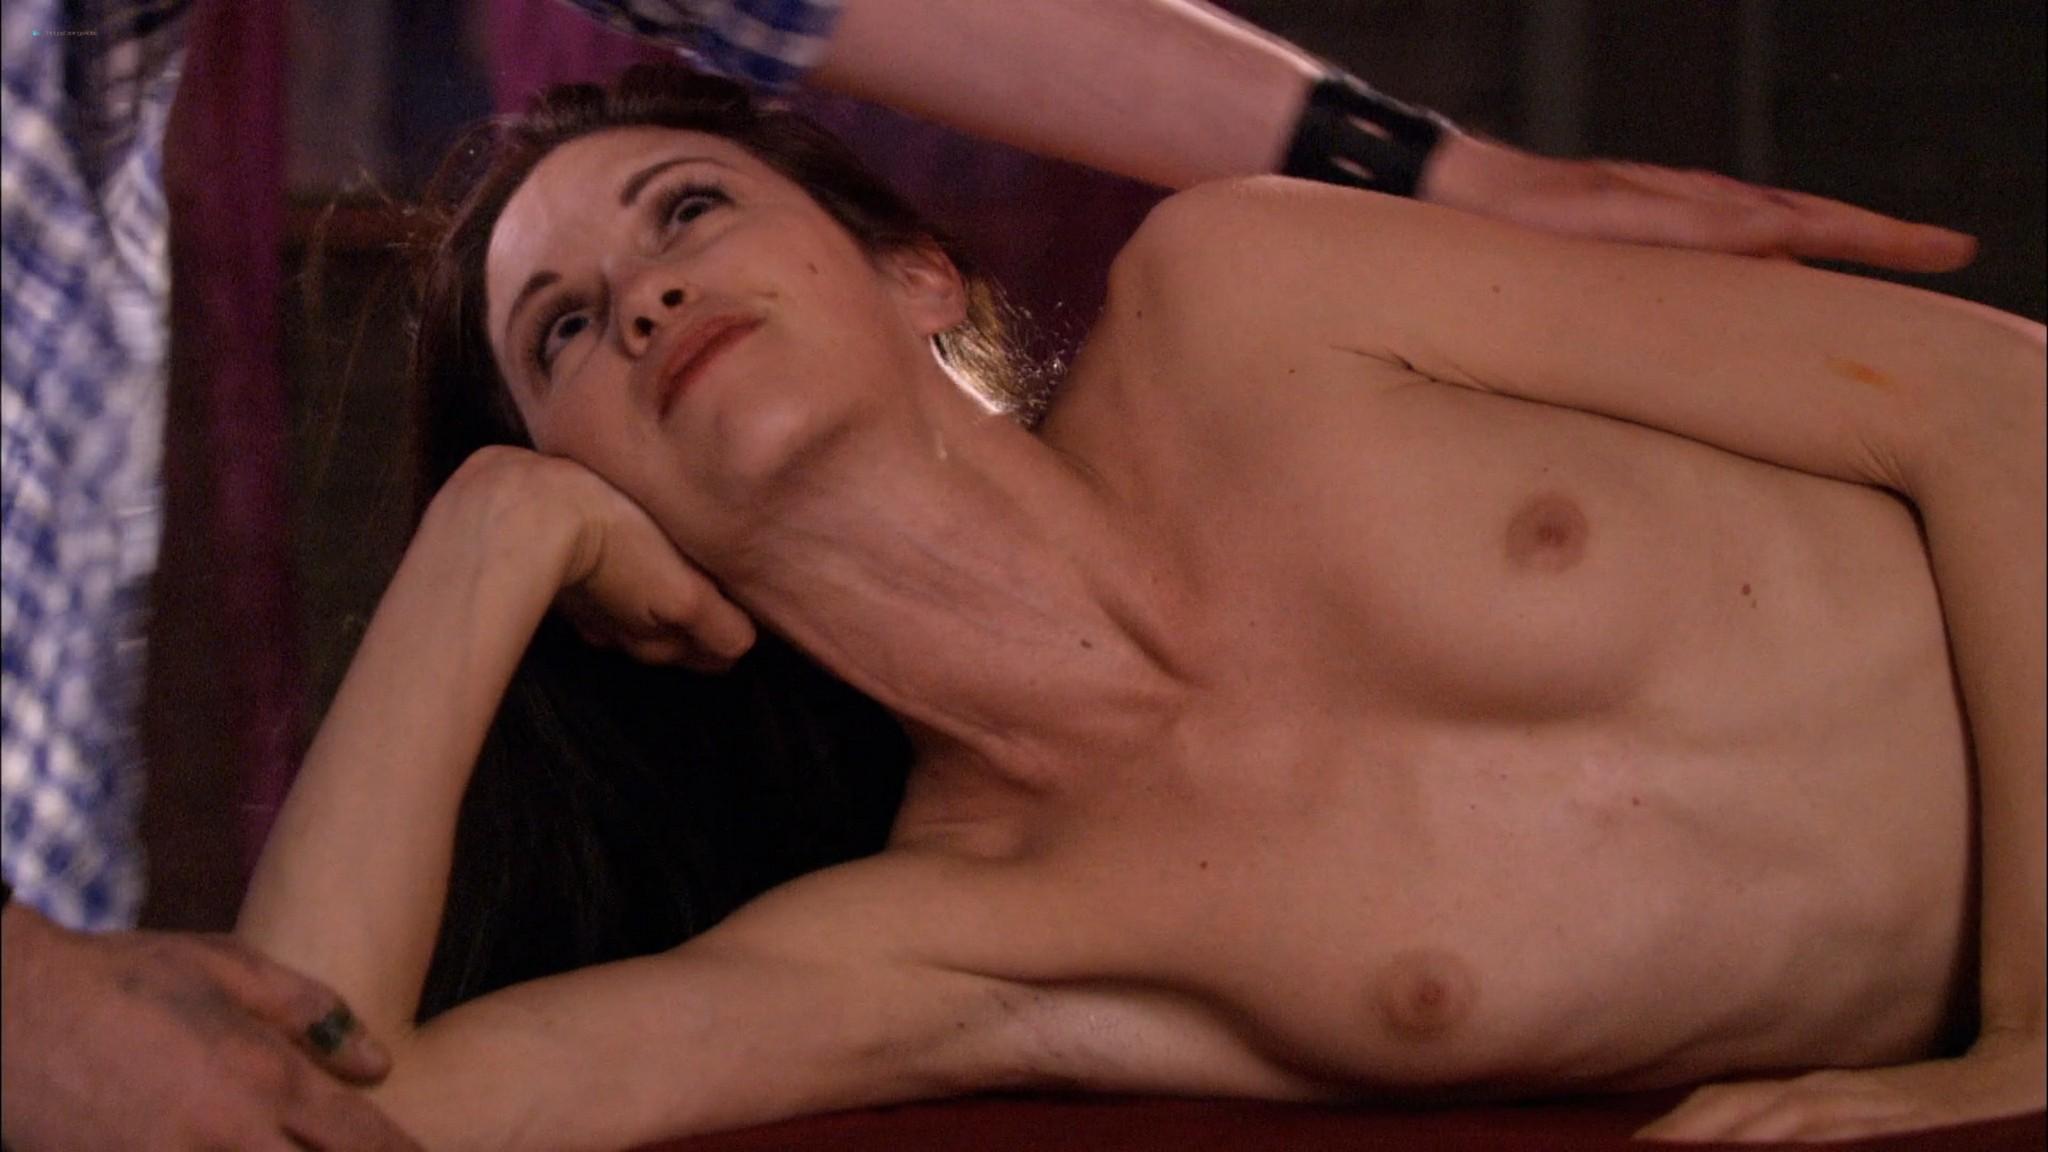 Lana Tailor nude sex Denise Cobar Jennifer Korbin all nude and hot sex Lingerie 2010 s2e7 HD 1080p Web 8